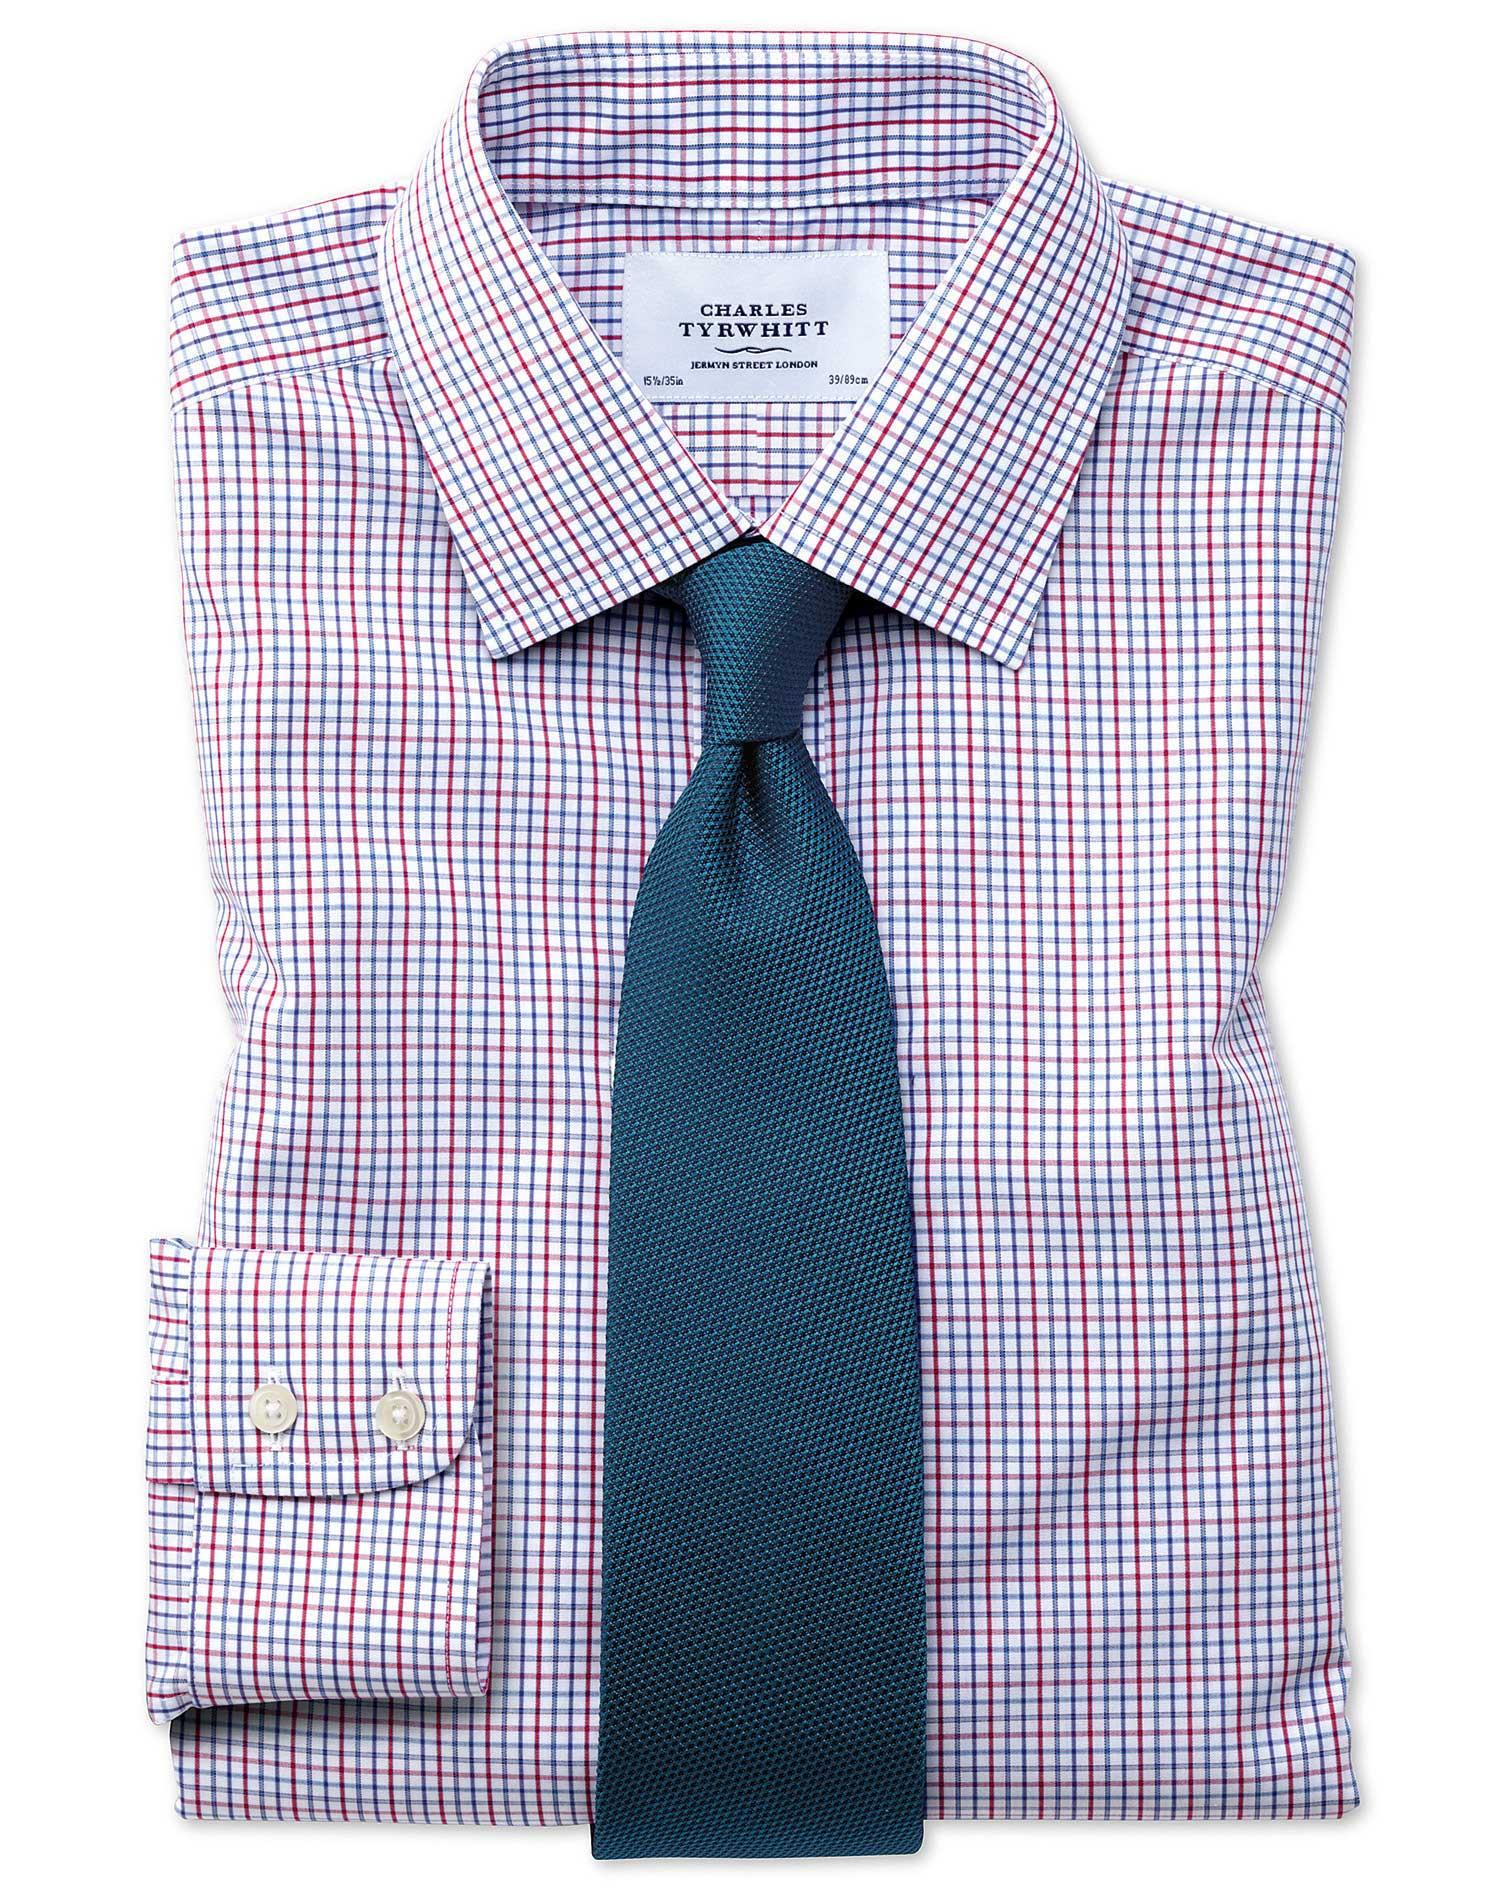 Slim fit non iron grid check multi shirt charles tyrwhitt for Slim fit non iron shirts